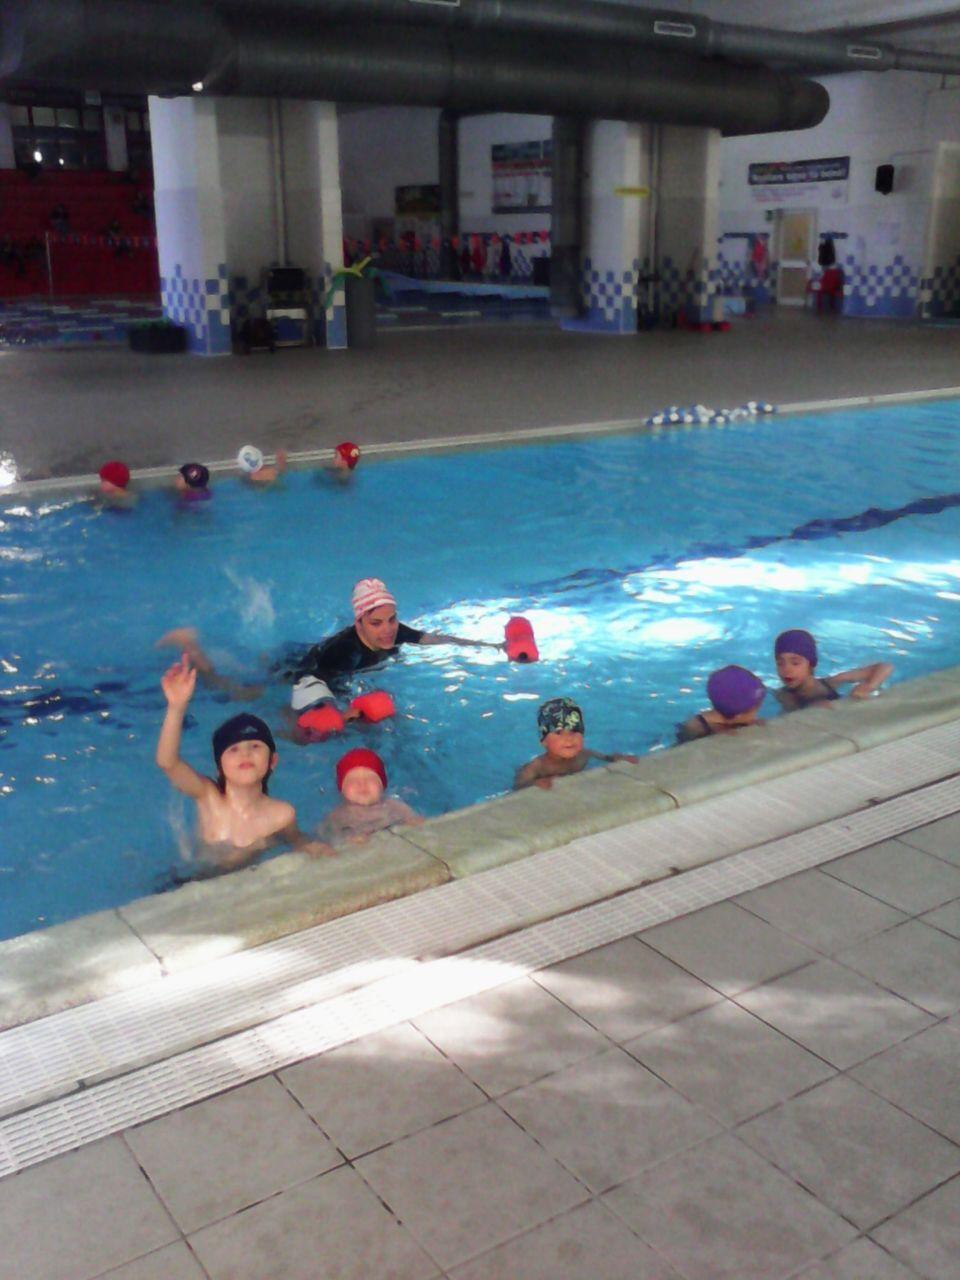 Piscina pieve emanuele - Corsi piscina neonati ...